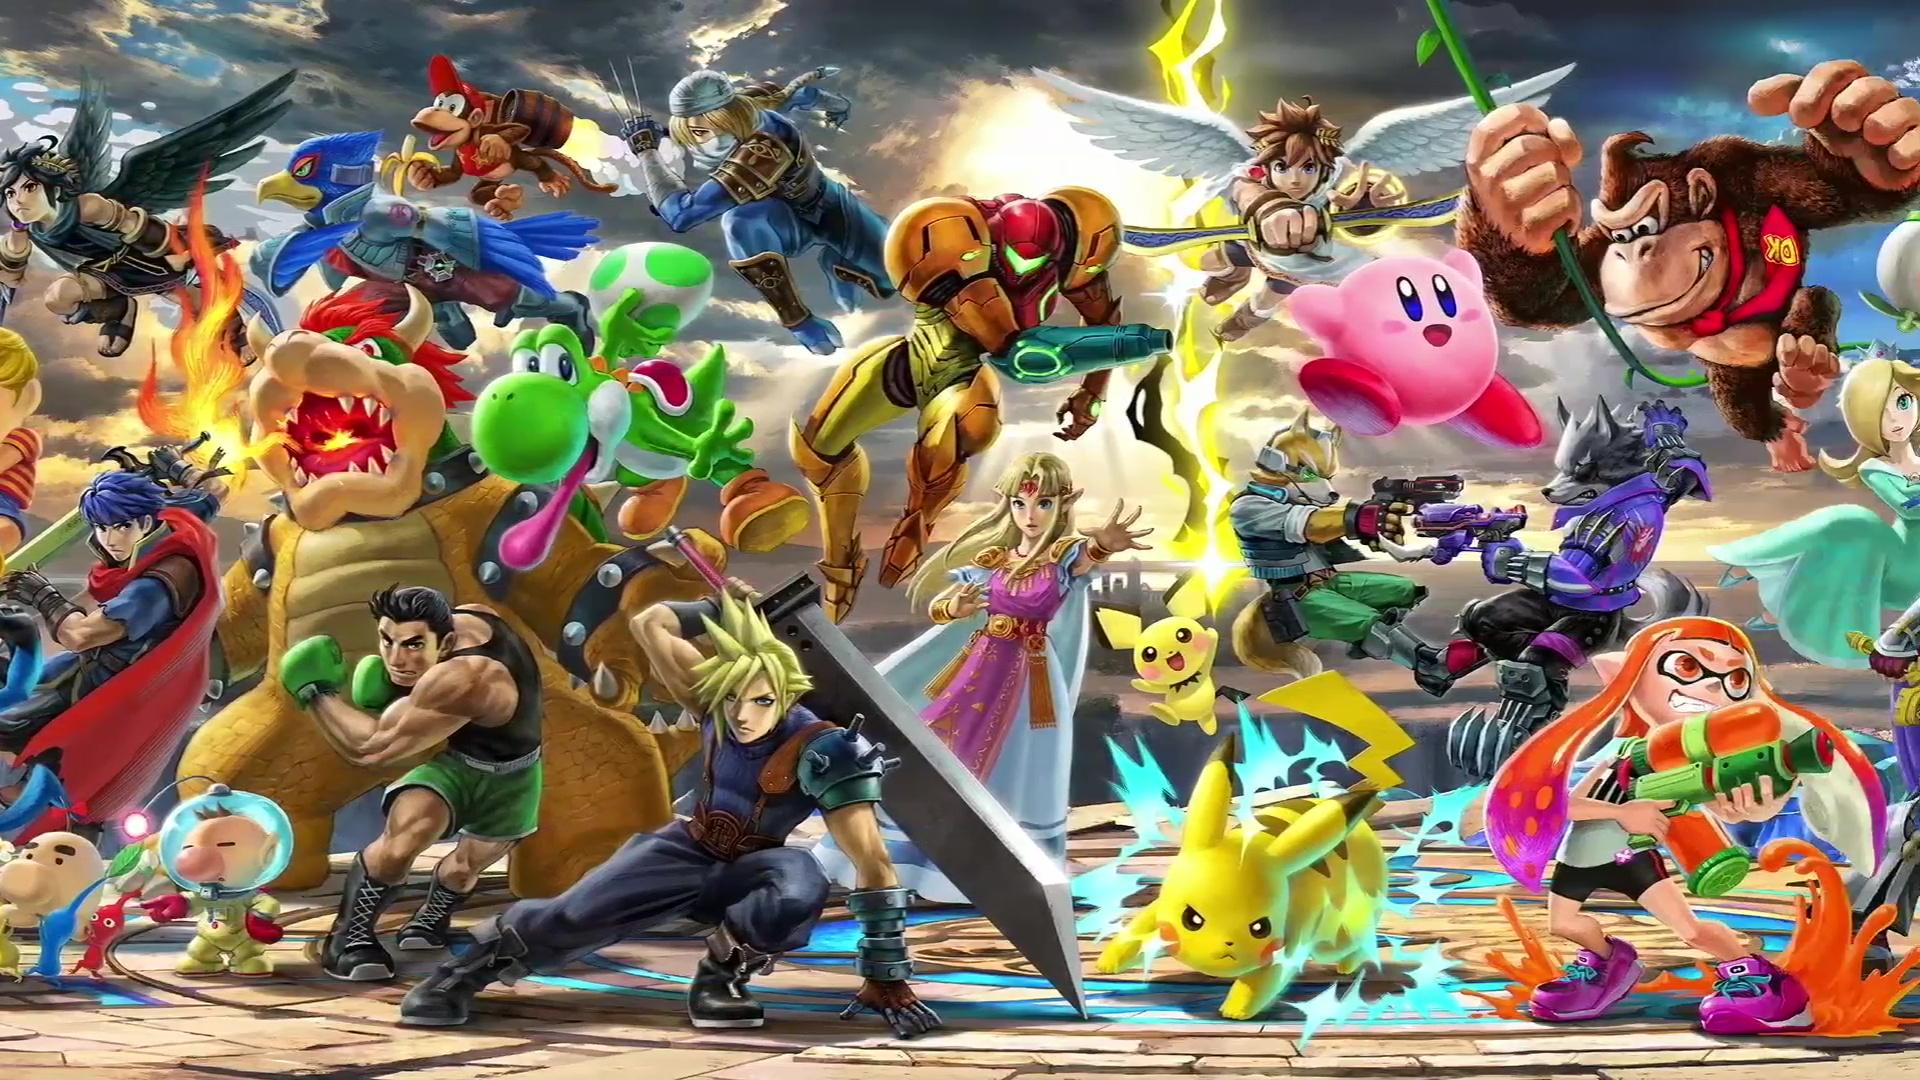 Super Smash Bros Wallpaper Phone Posted By John Cunningham